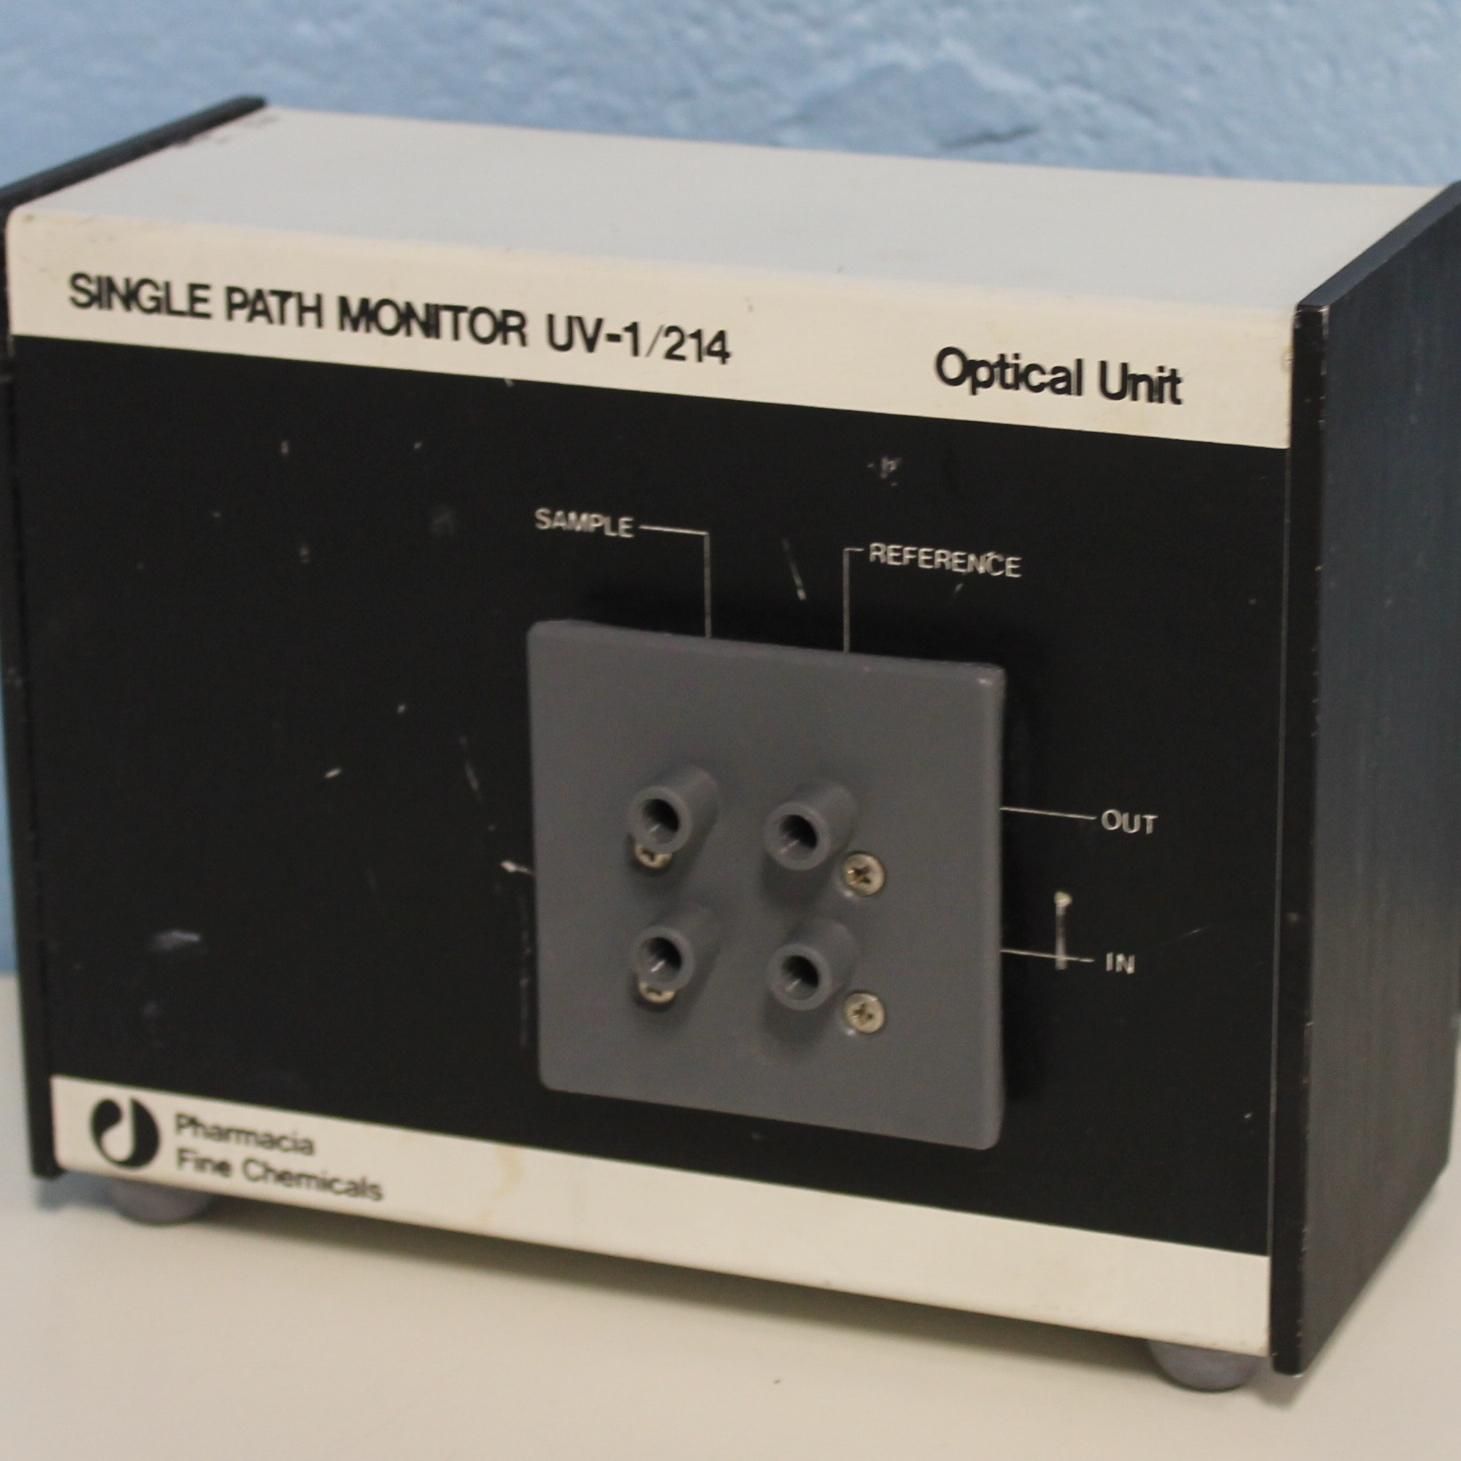 Pharmacia Single Path Monitor UV-1/214 Optical Unit Image